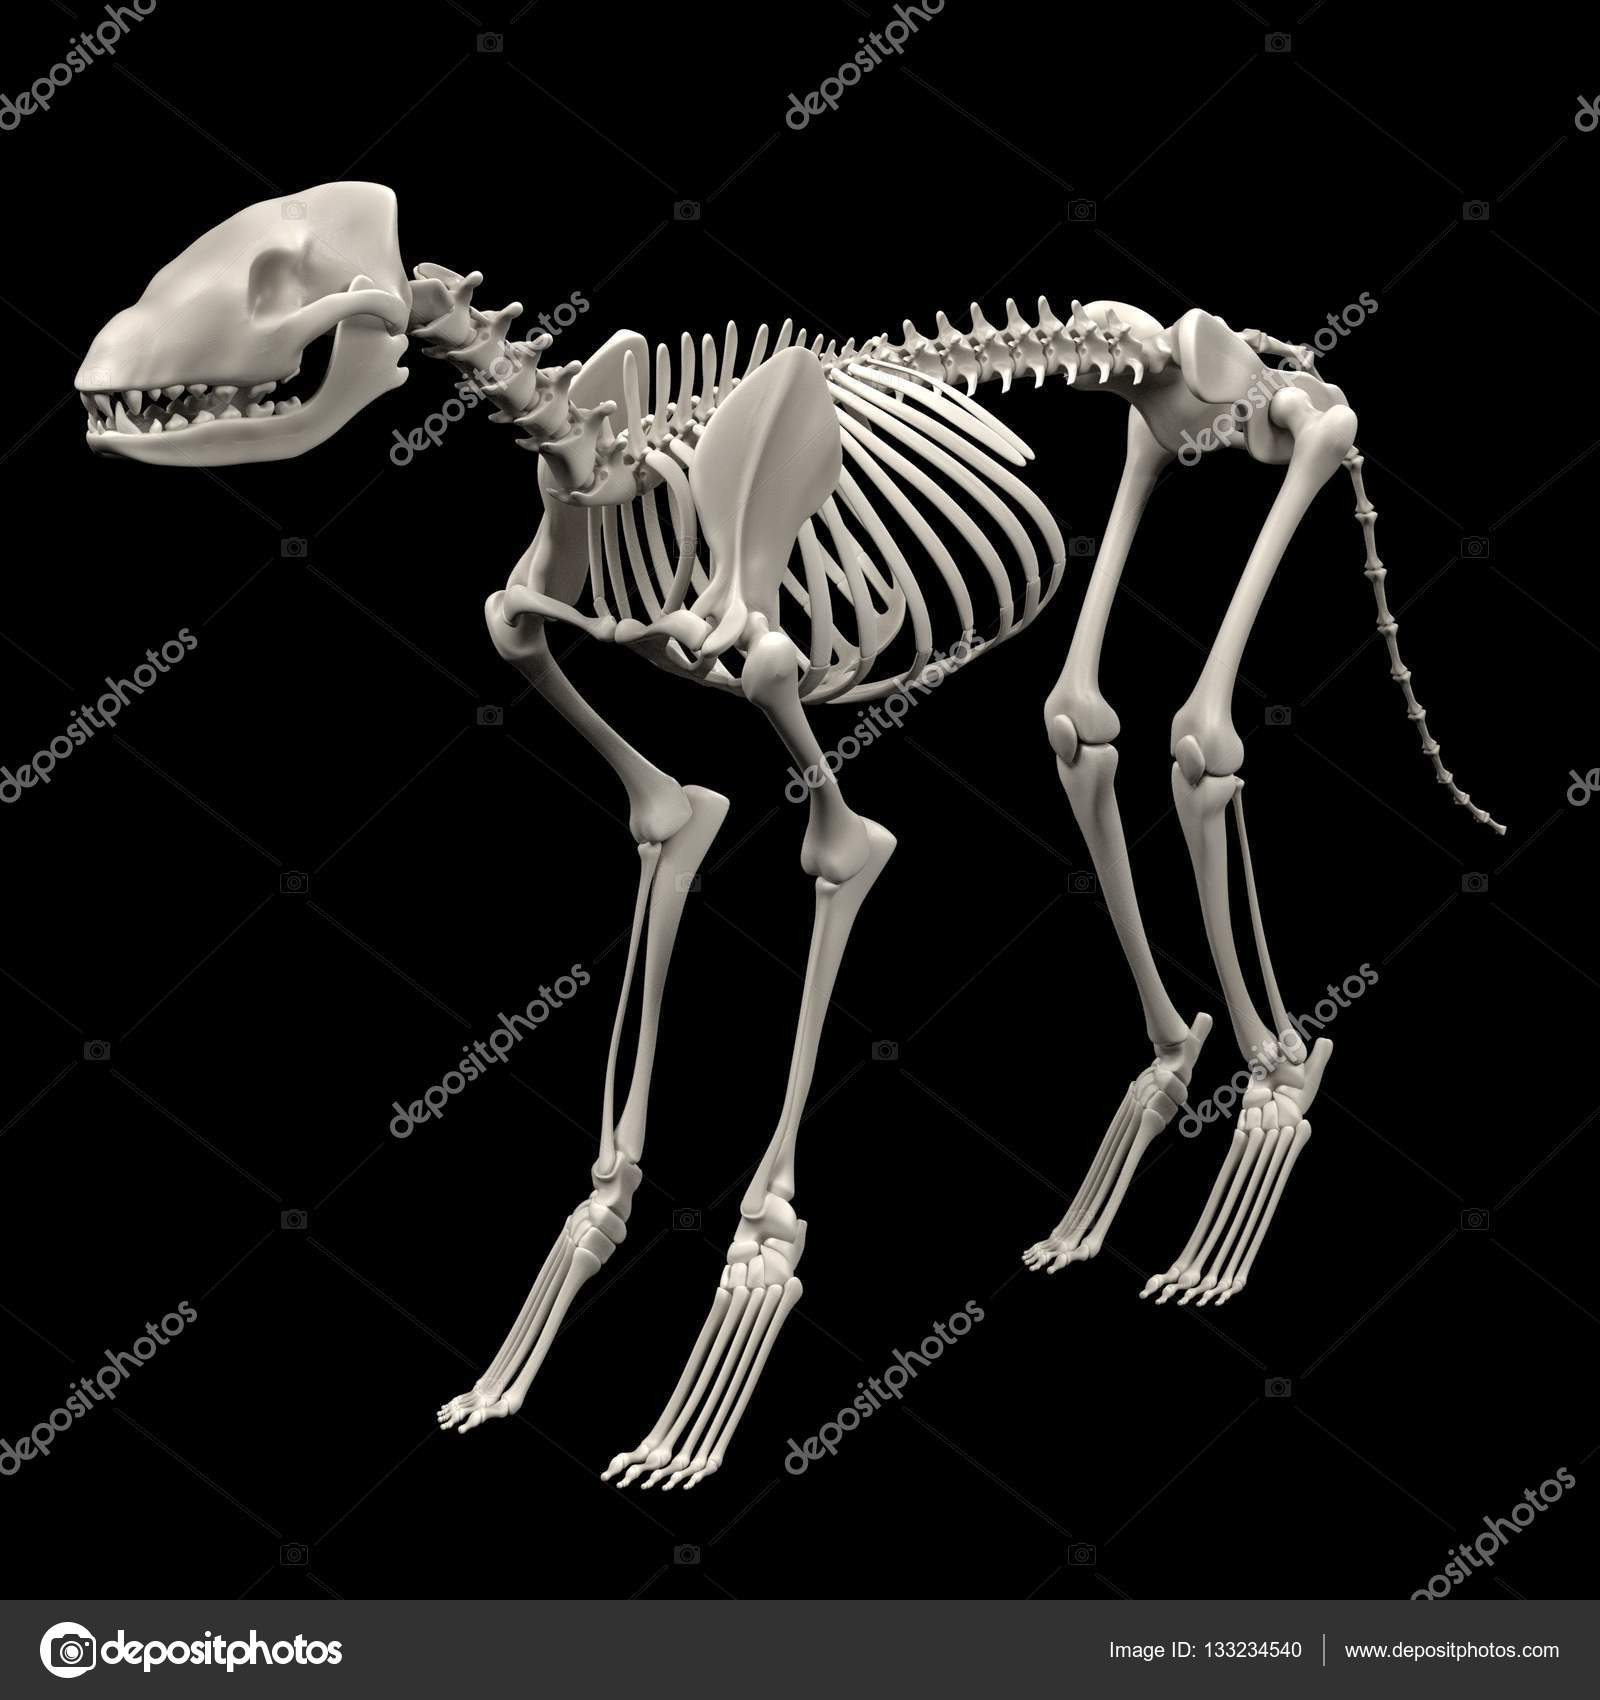 realistische 3d render Hund Skelett — Stockfoto © 3drenderings ...